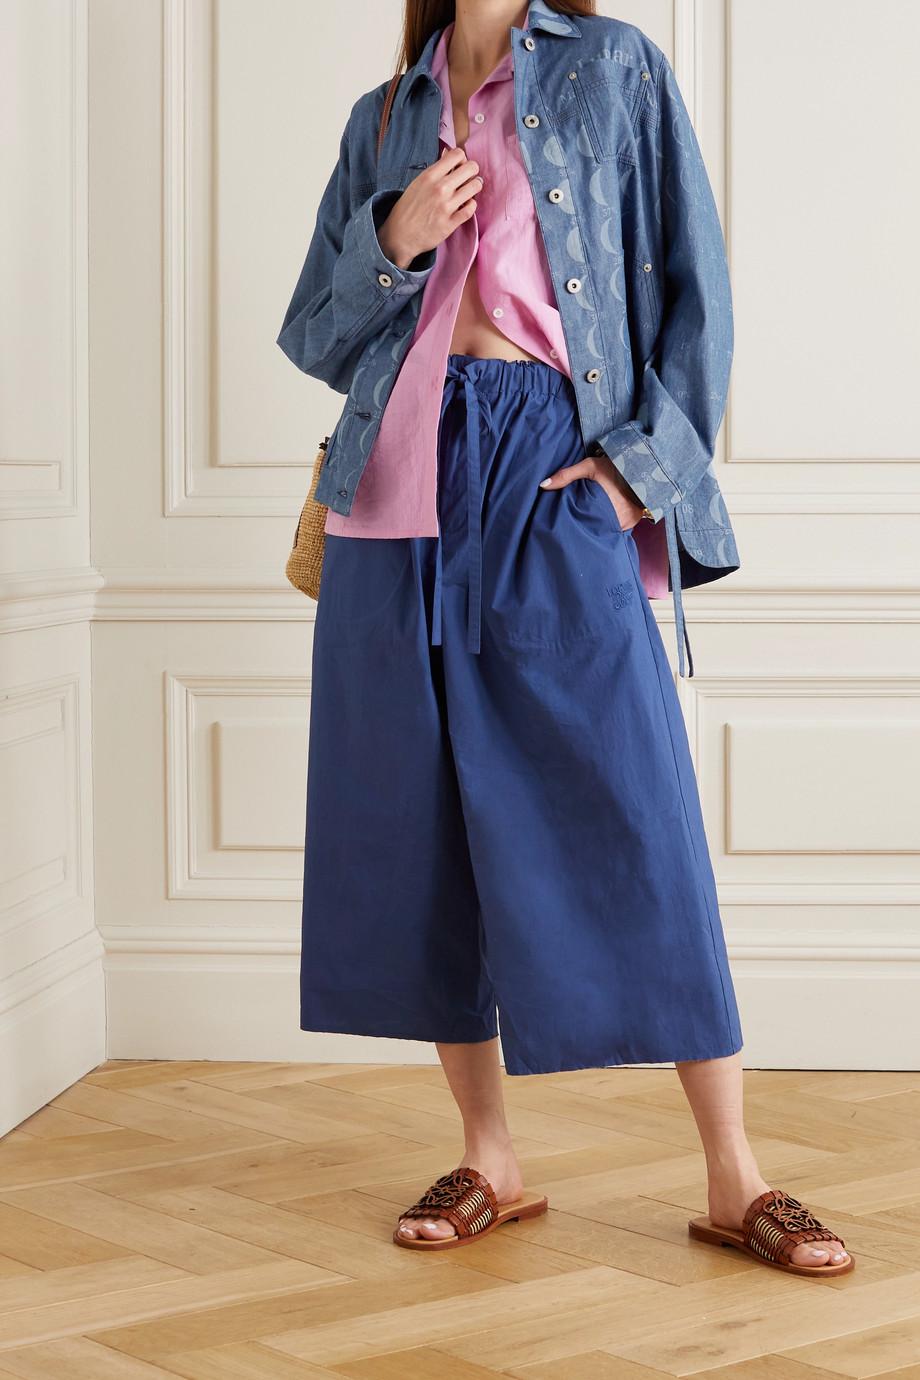 Loewe Veste en chambray de coton imprimé x Paula's Ibiza